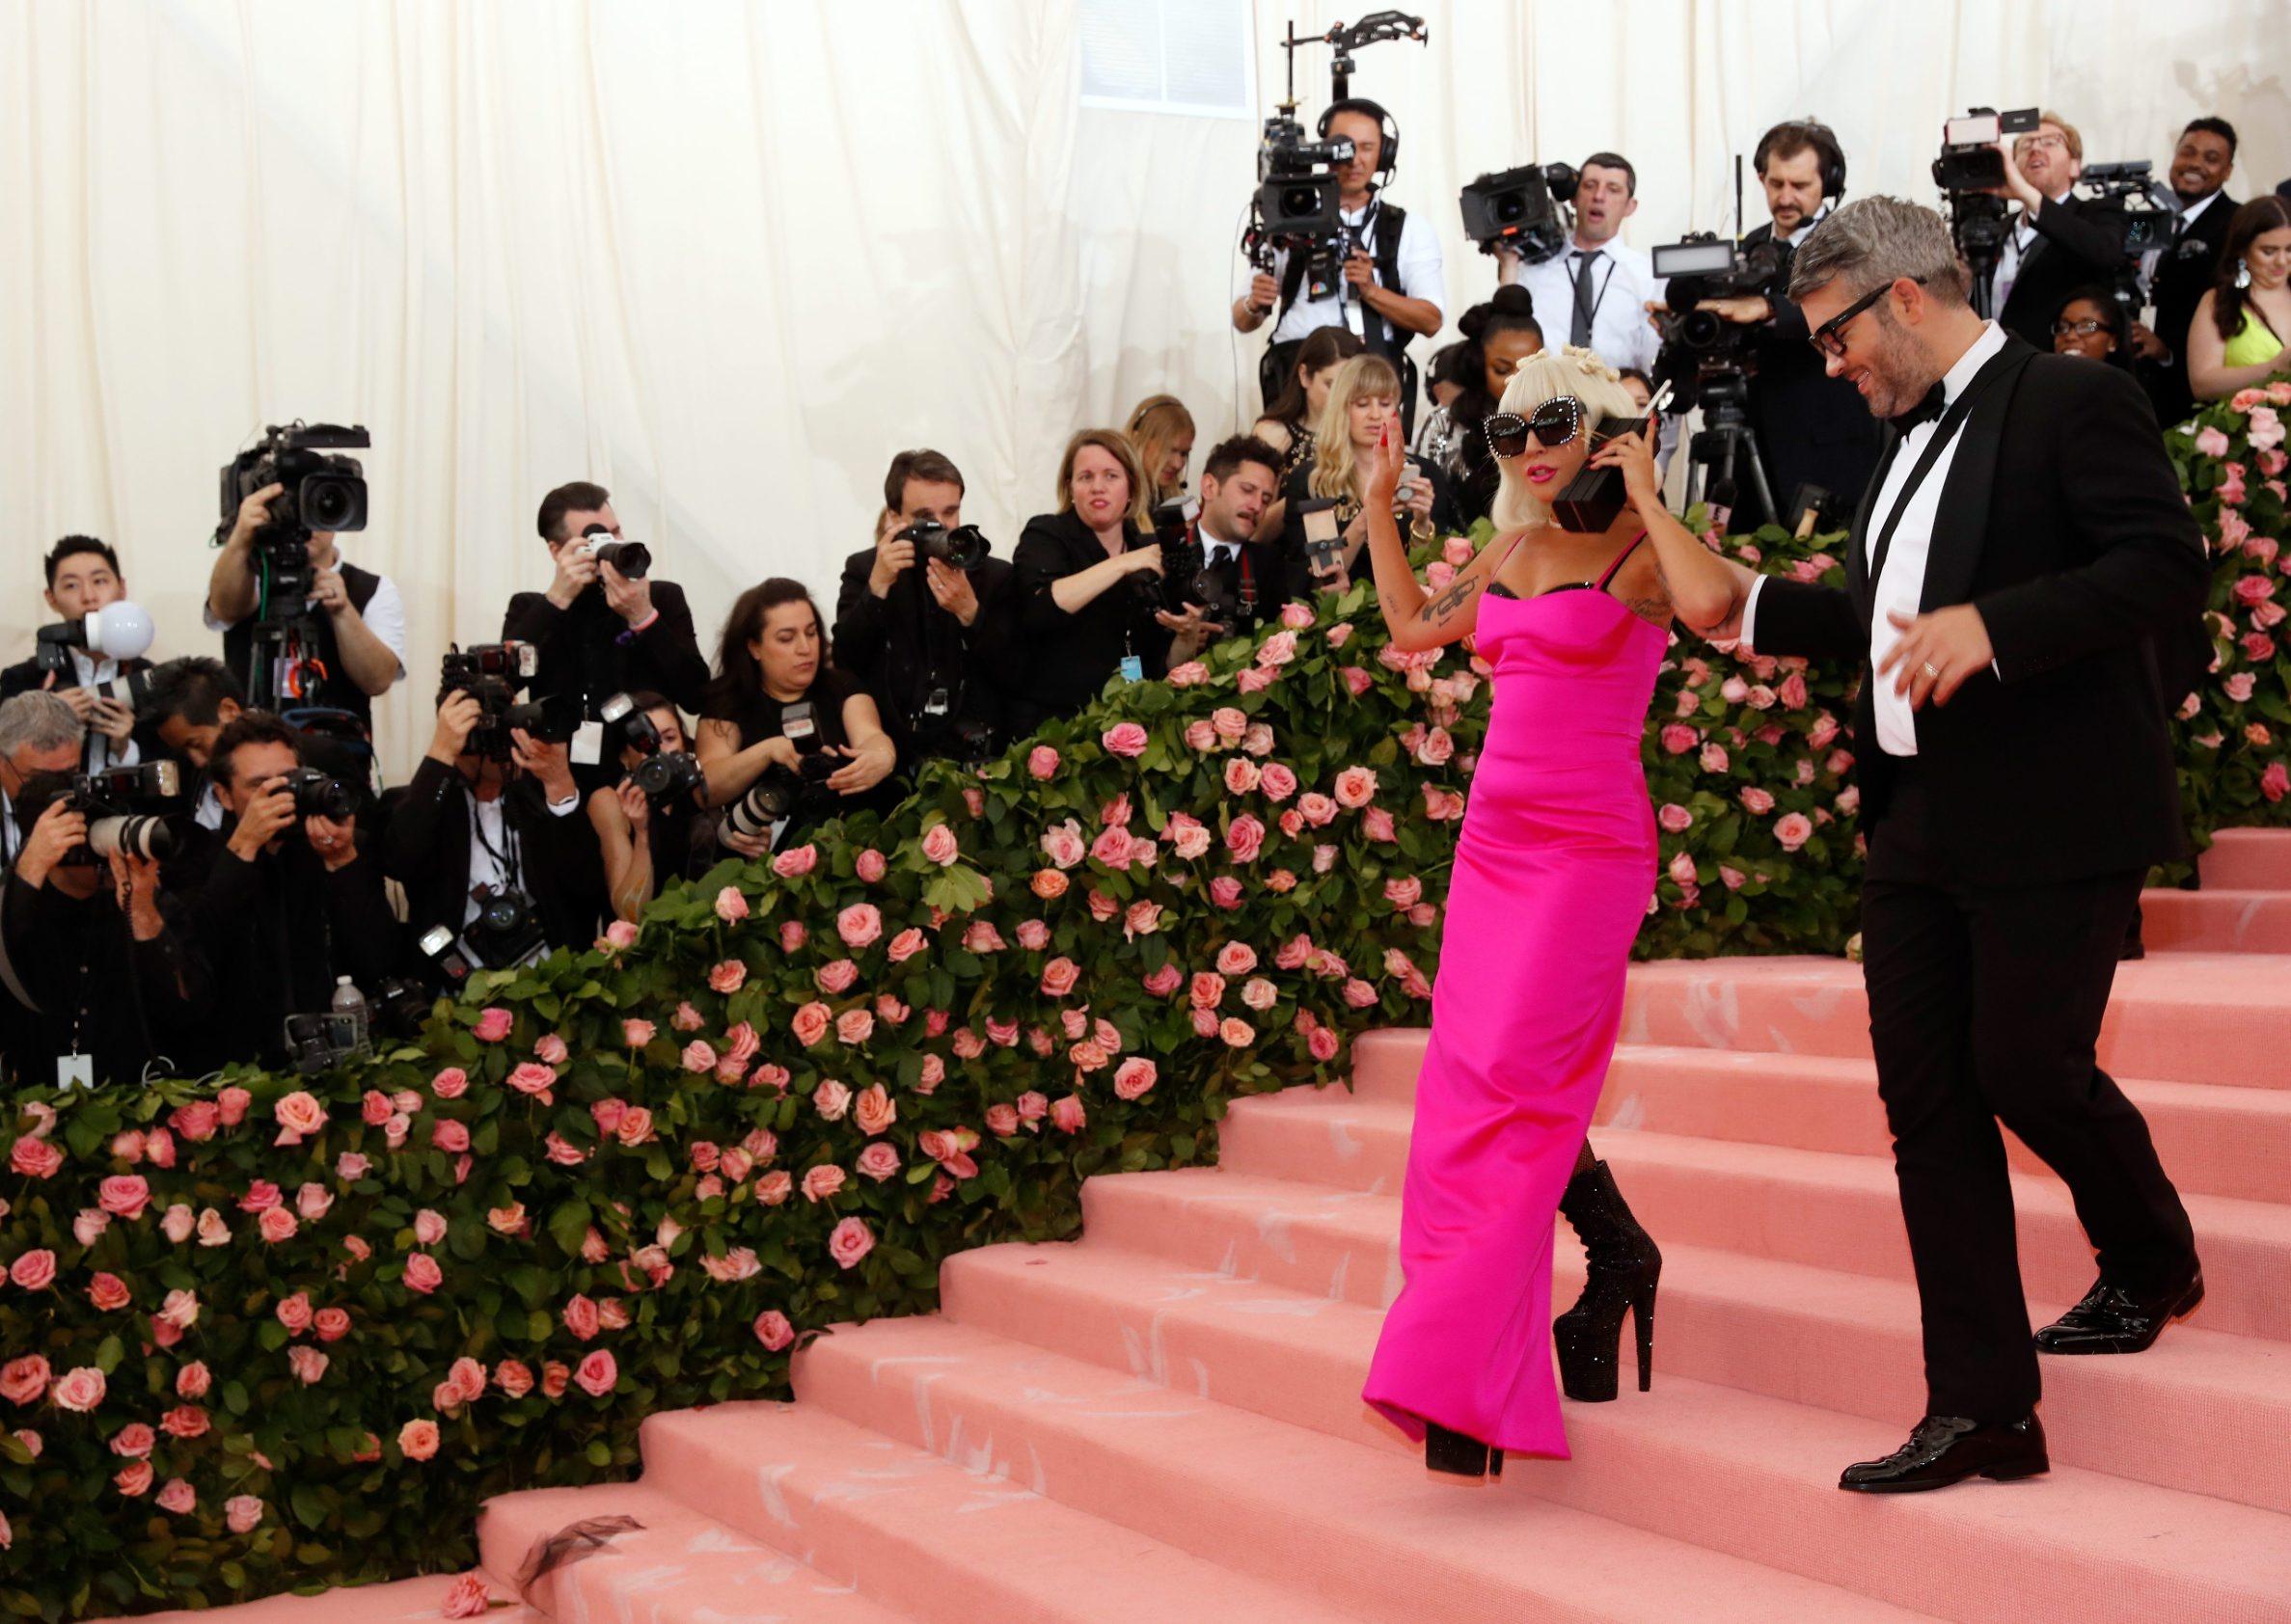 Metropolitan Museum of Art Costume Institute Gala - Met Gala - Camp: Notes on Fashion- Arrivals - New York City, U.S. Äi May 6, 2019 - Lady Gaga. REUTERS/Andrew Kelly